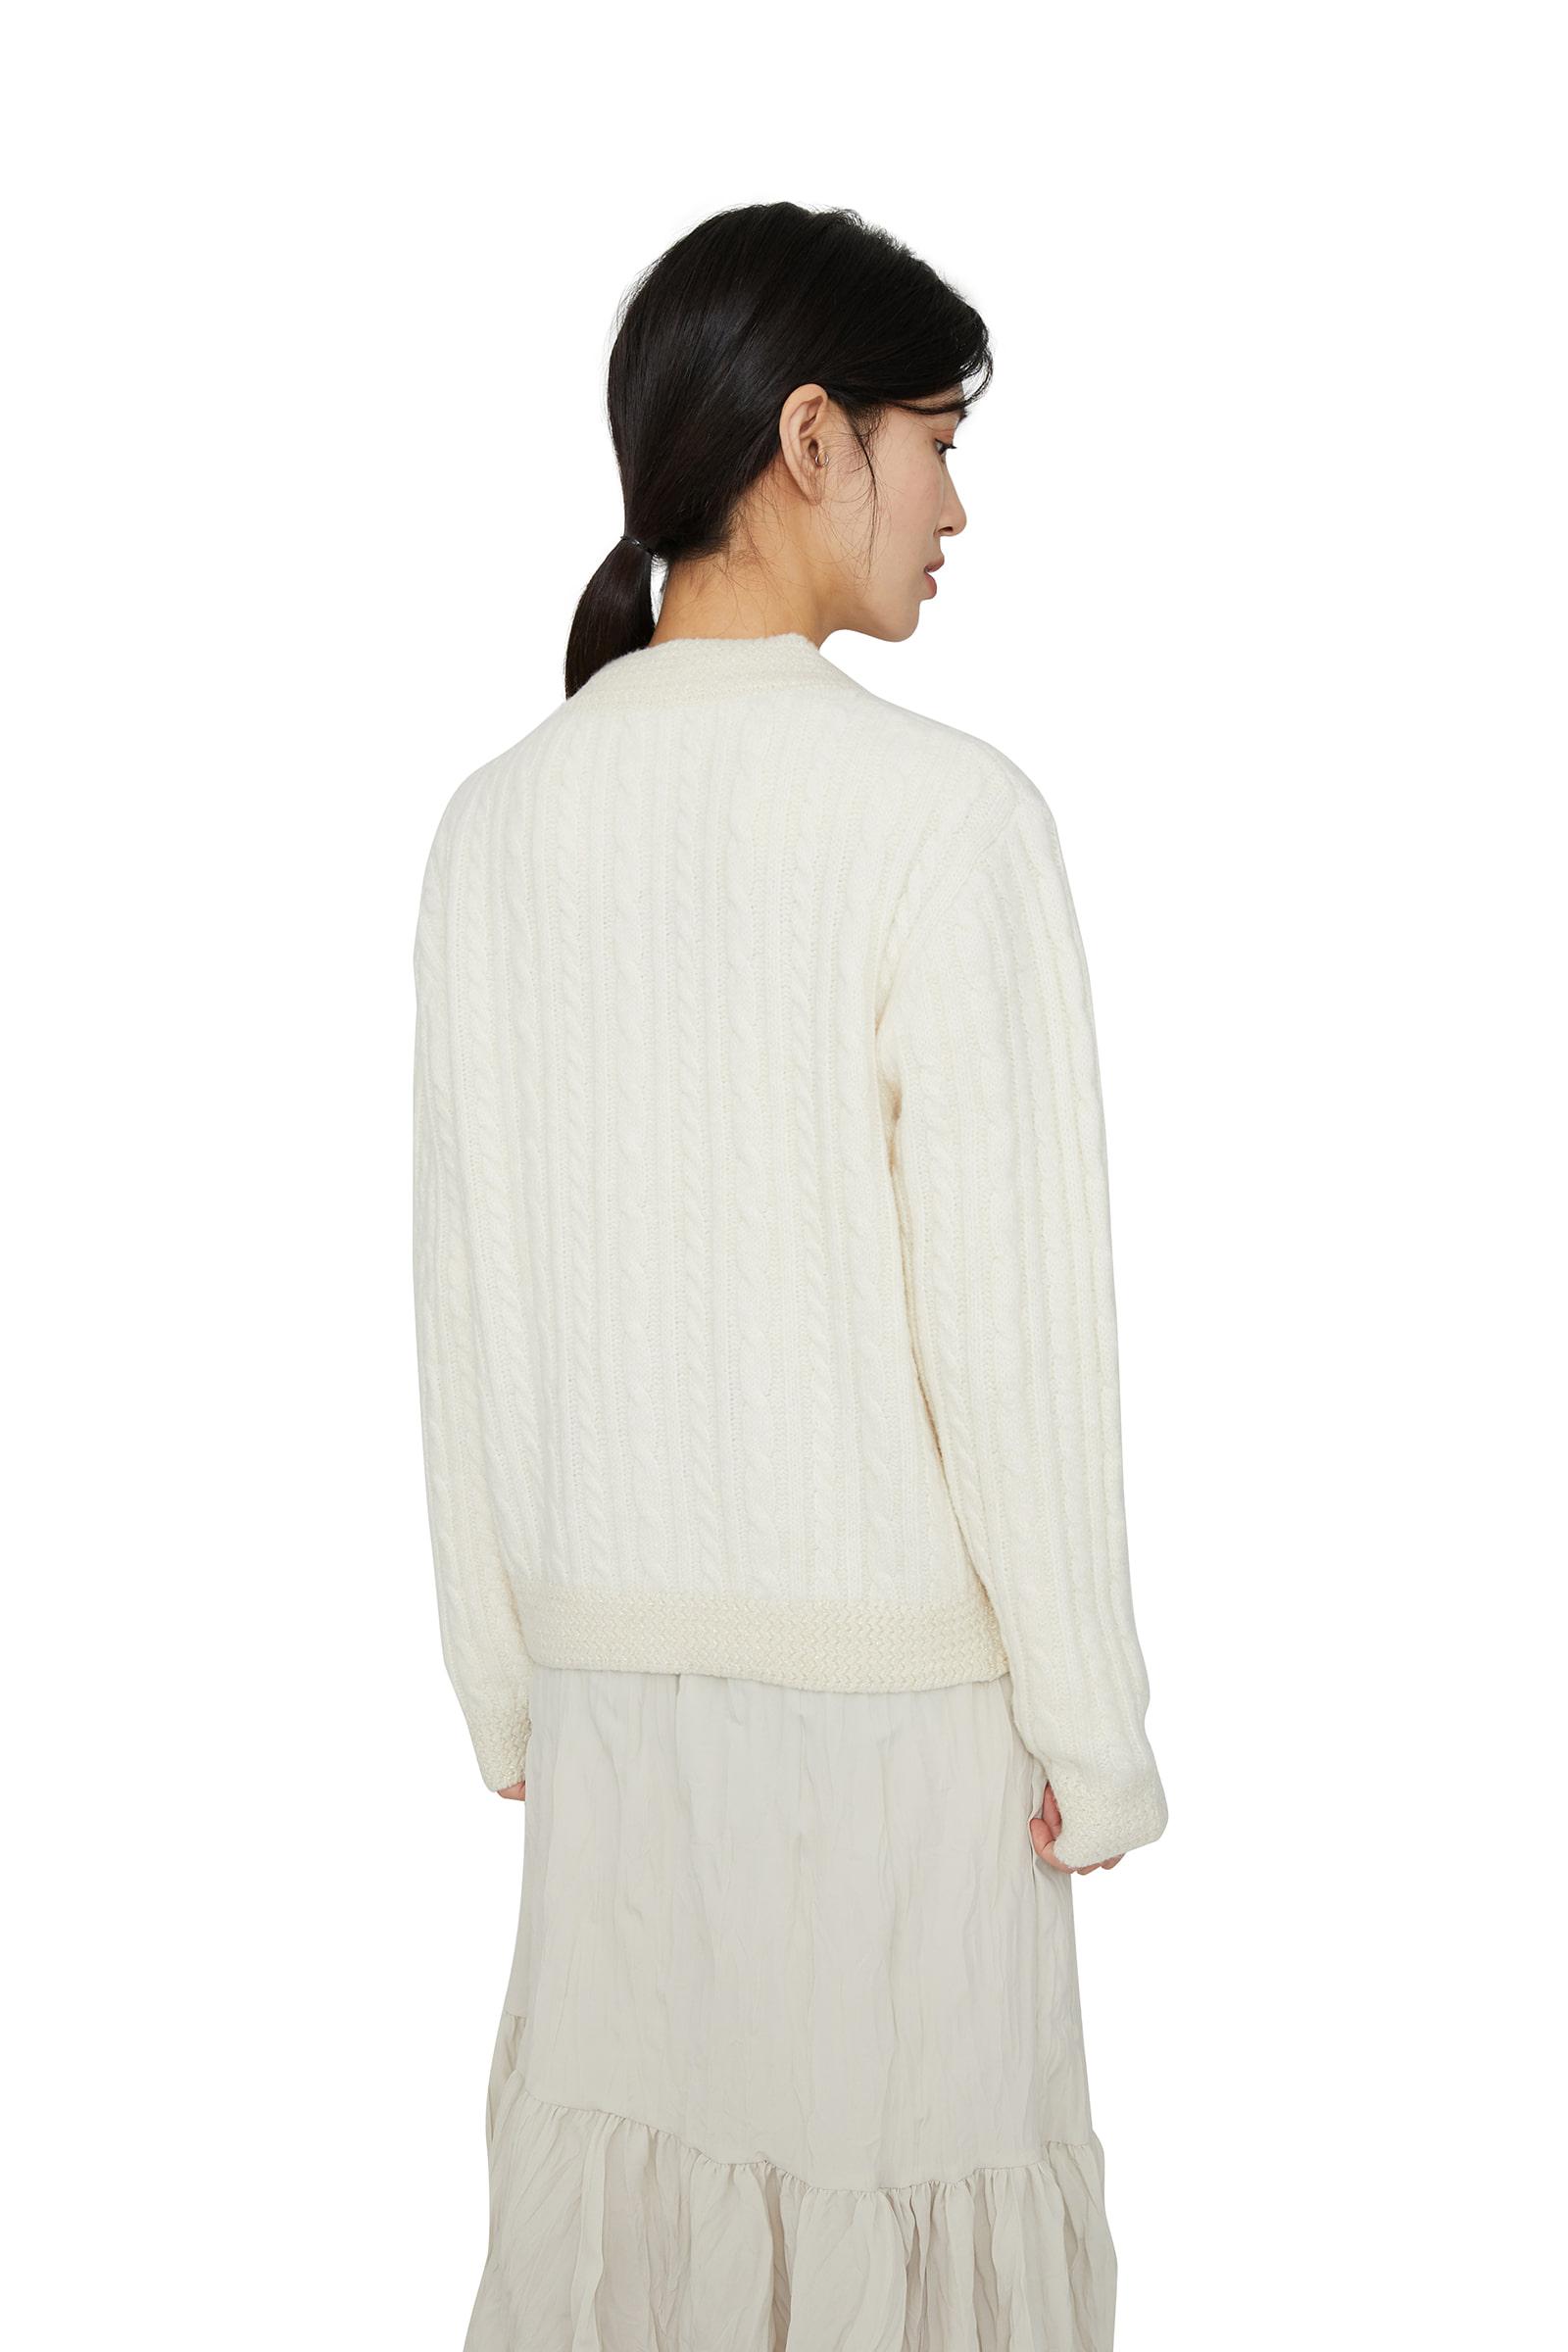 Coco Shine Knit Cardigan